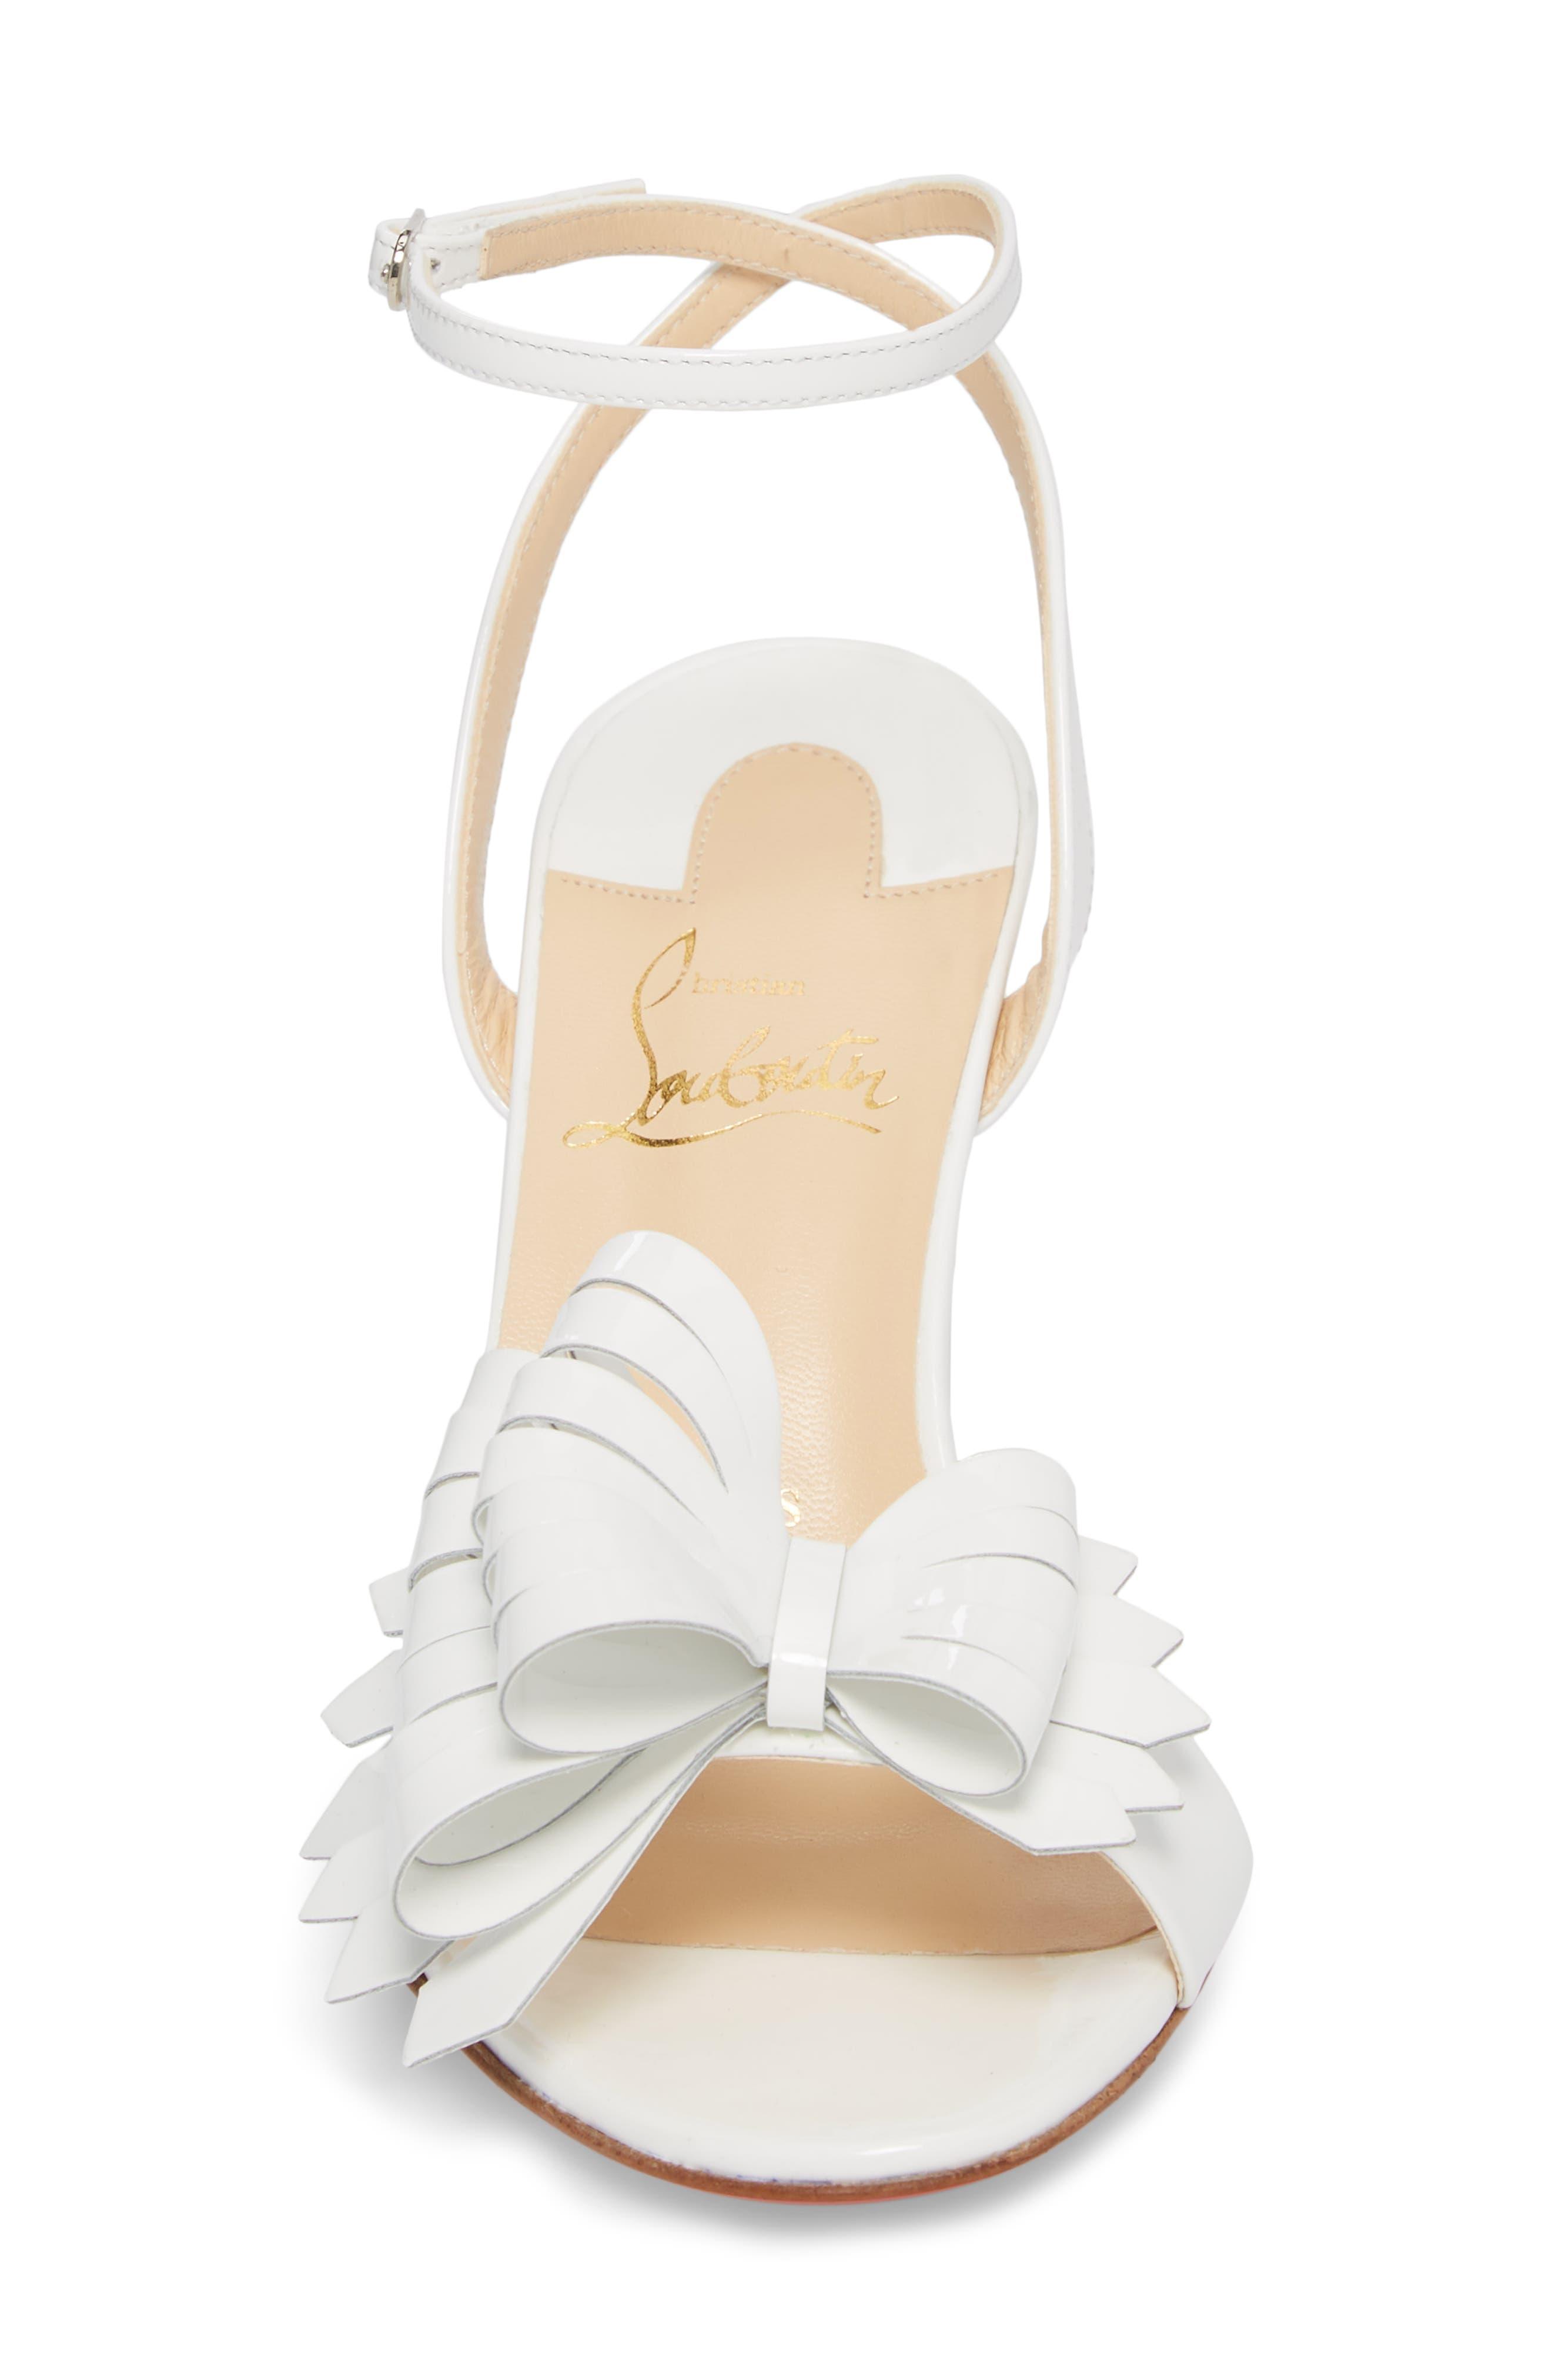 Miss Valois Bow Ankle Strap Sandal,                             Alternate thumbnail 8, color,